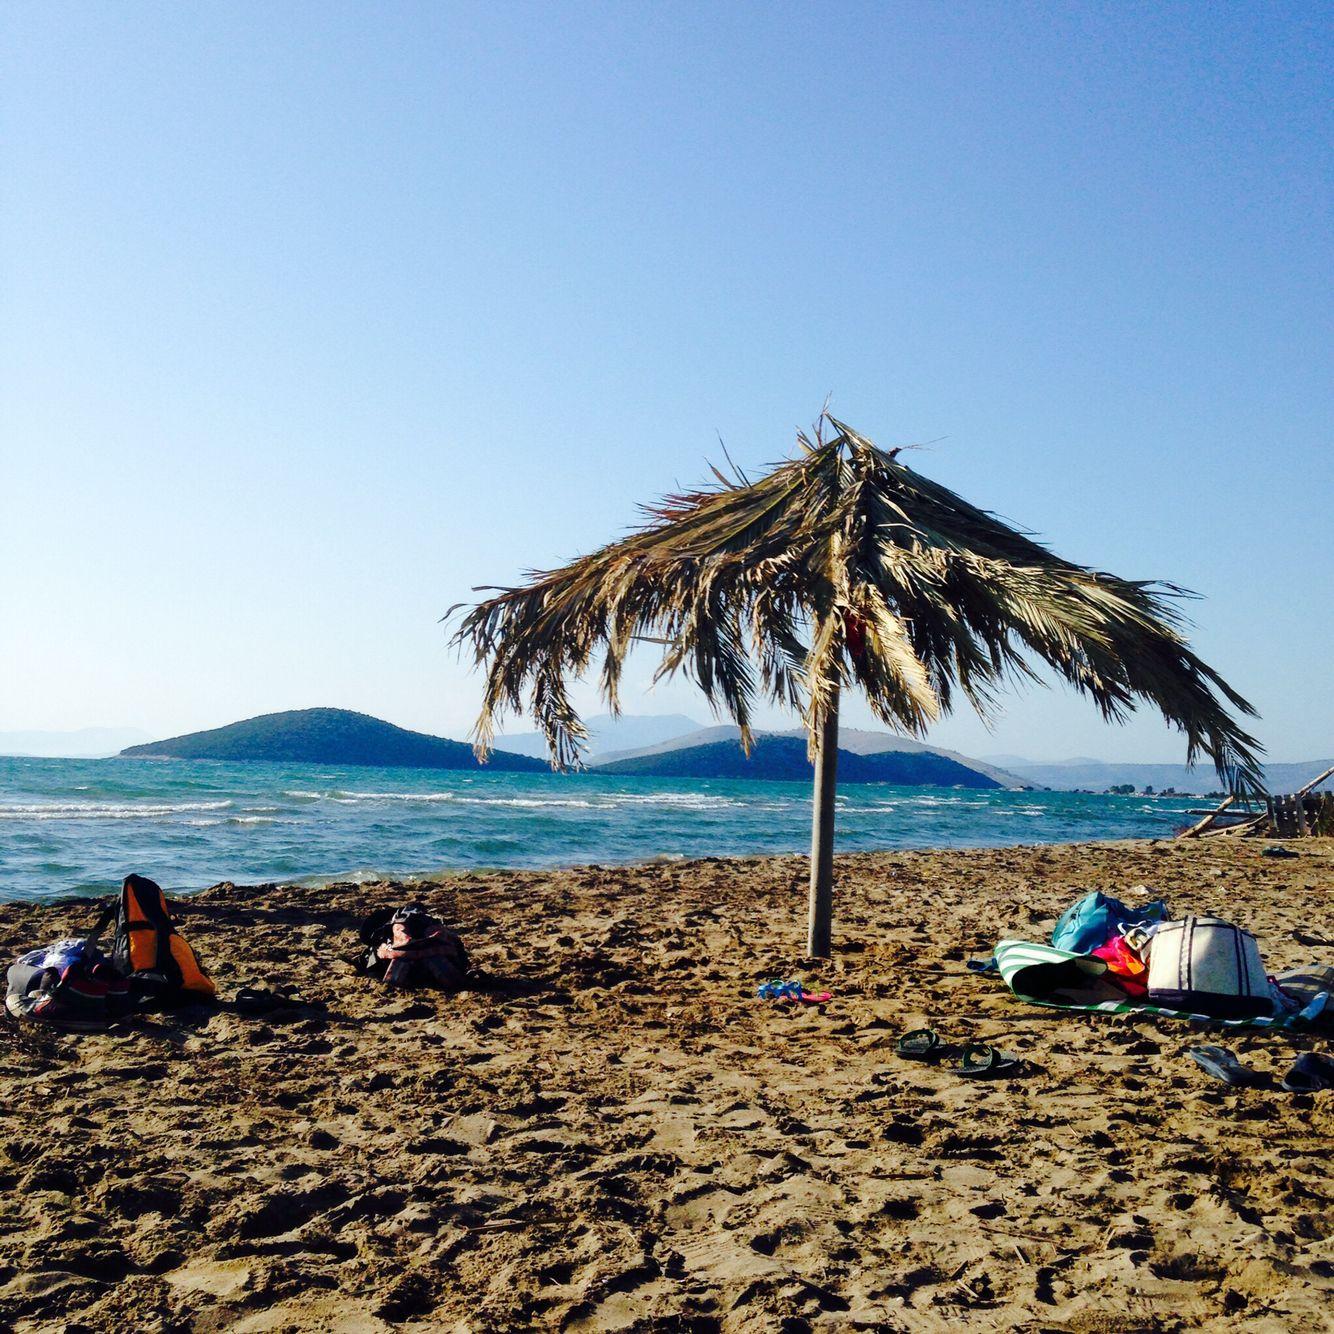 Beach near Κατοχή. Photo by Megan Lethbridge. Patio